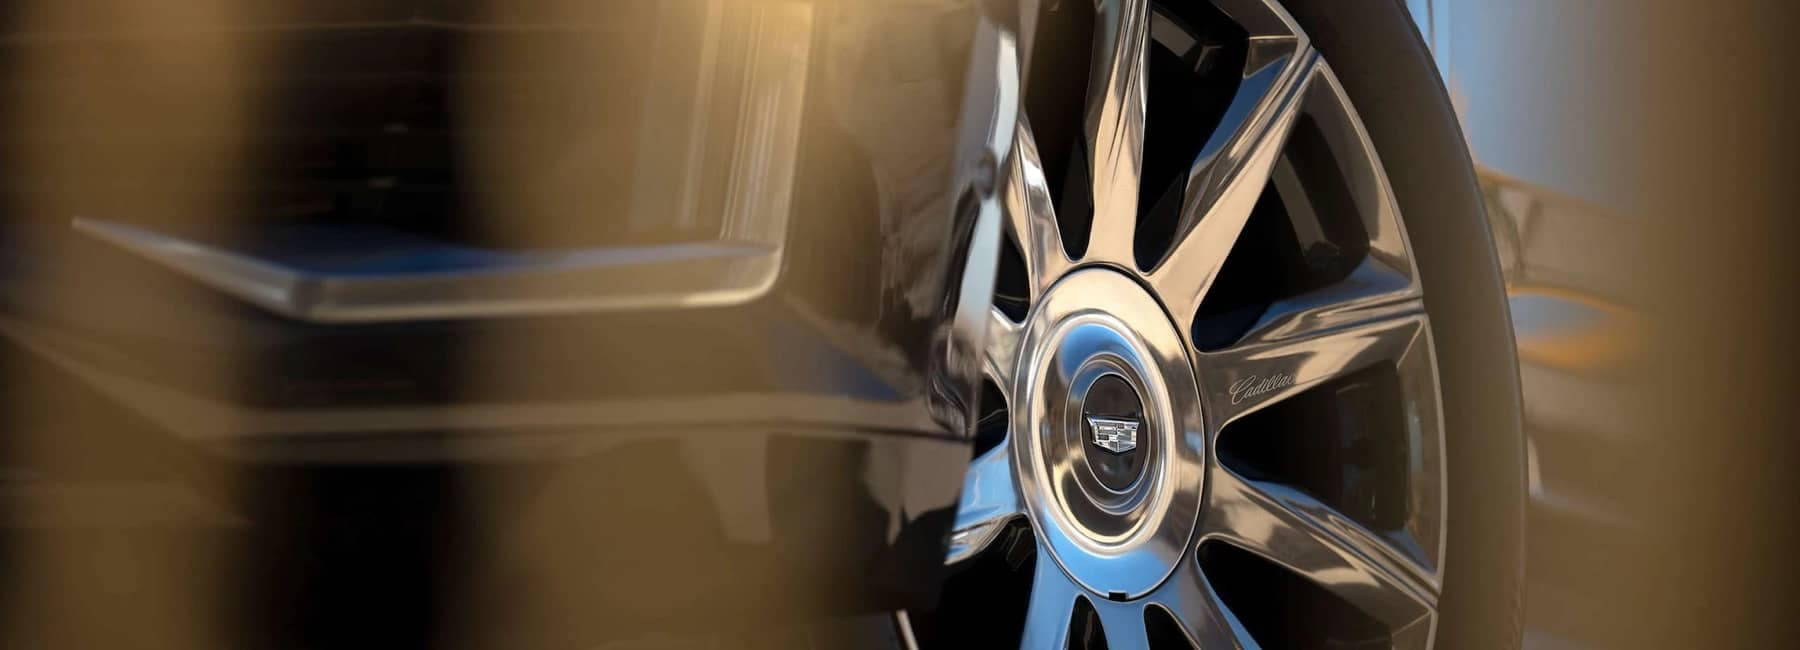 Cadillac Escalde Wheel